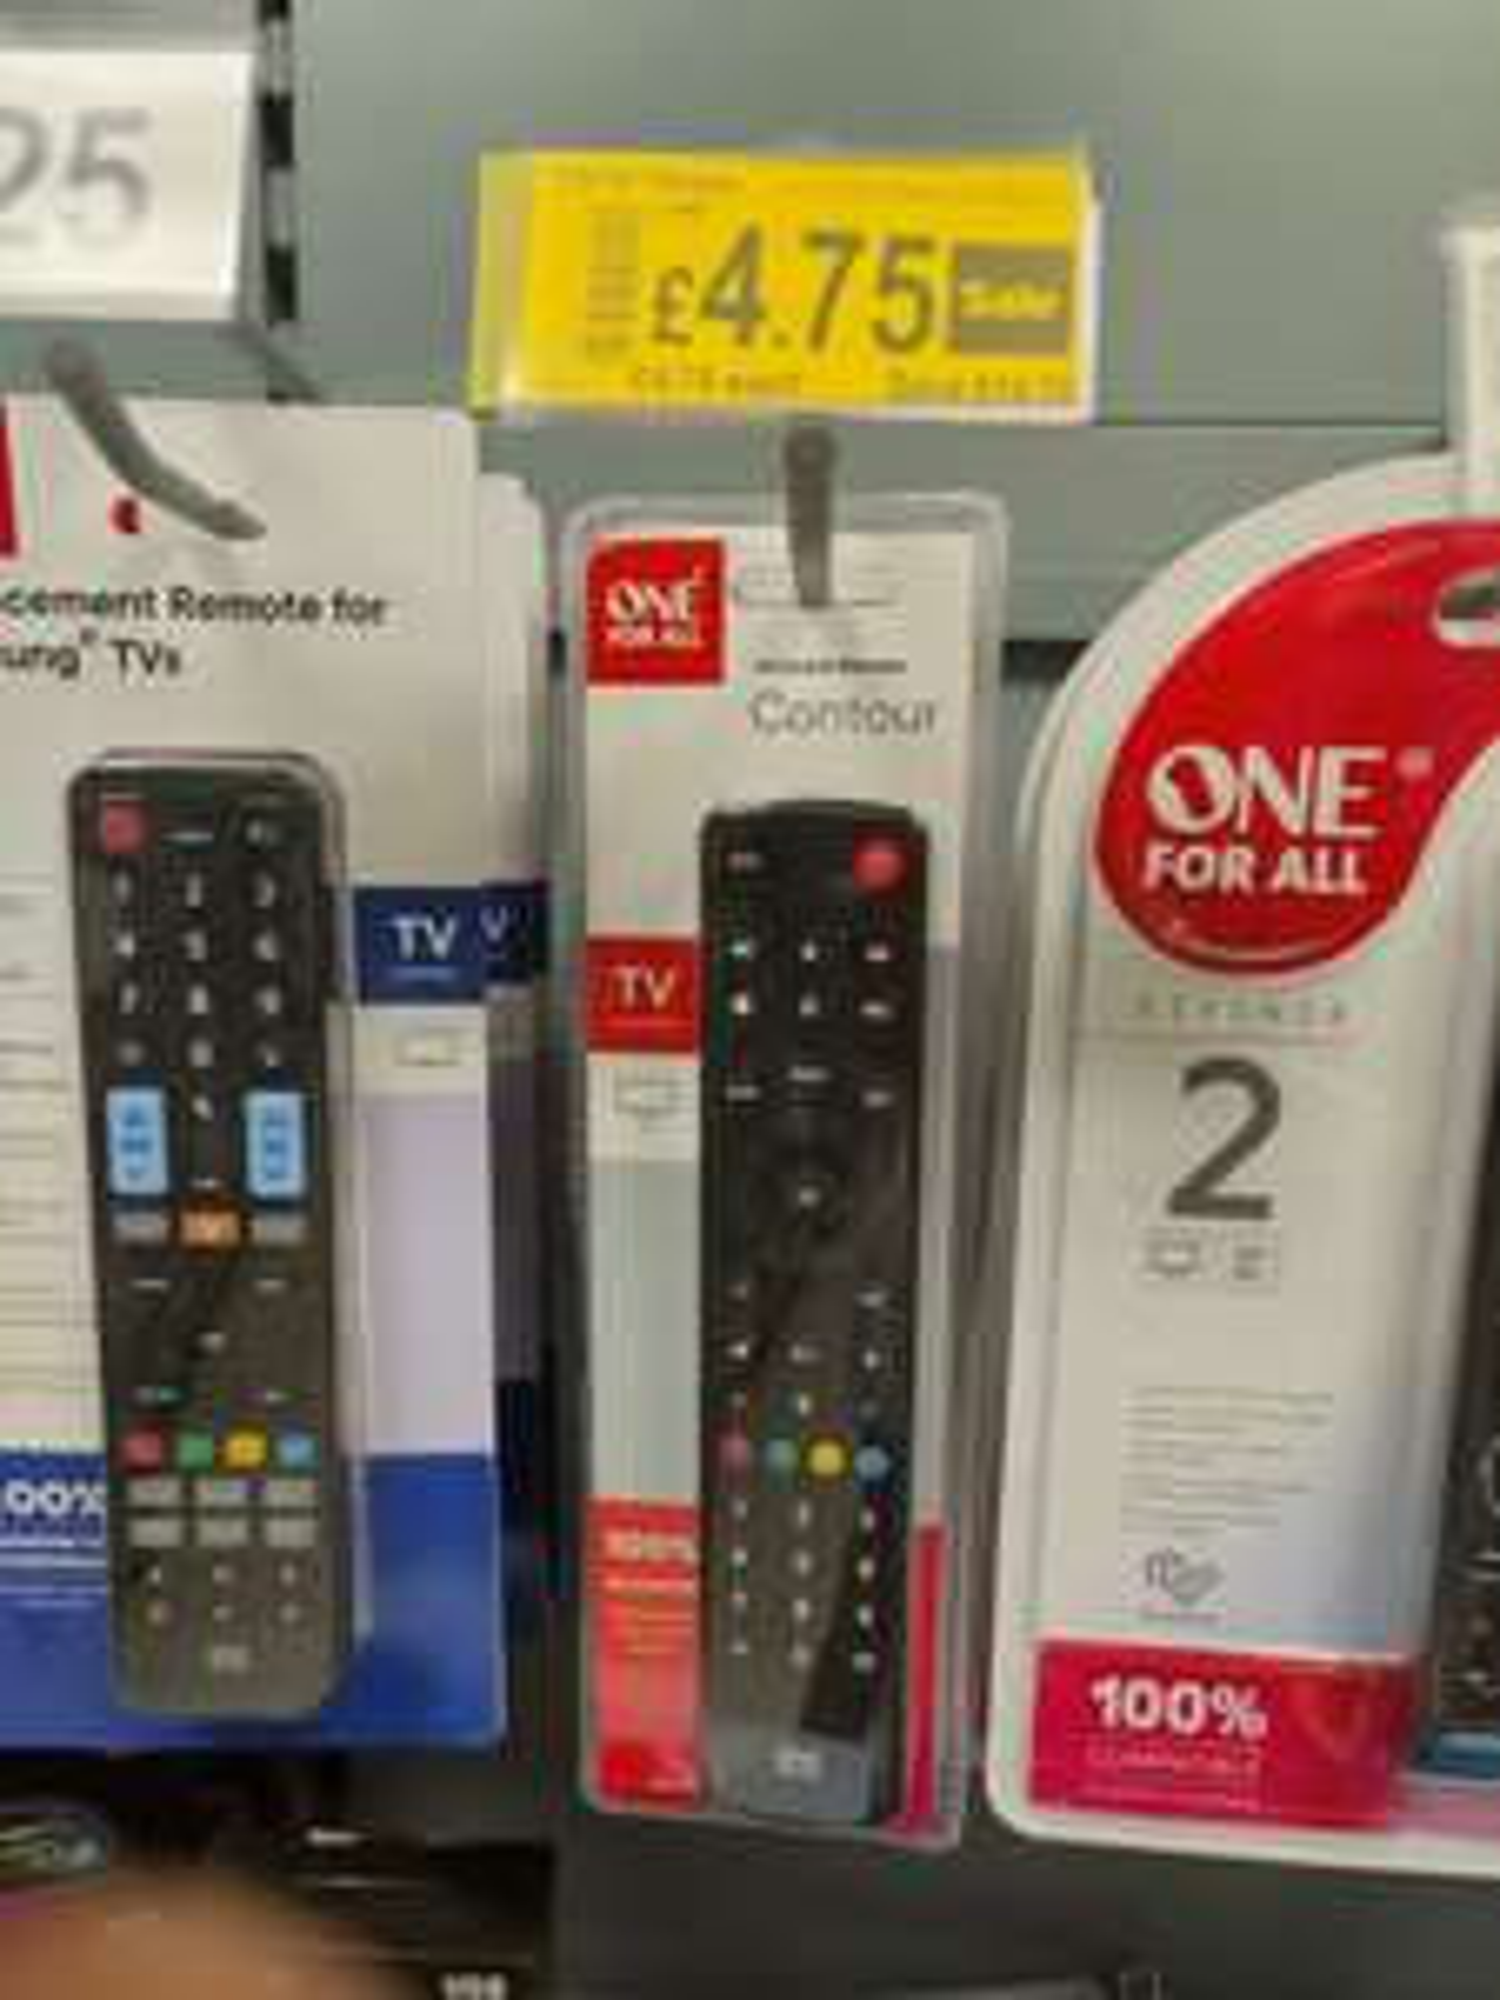 One for all contour universal remote Asda in store (Retford) for £4.75